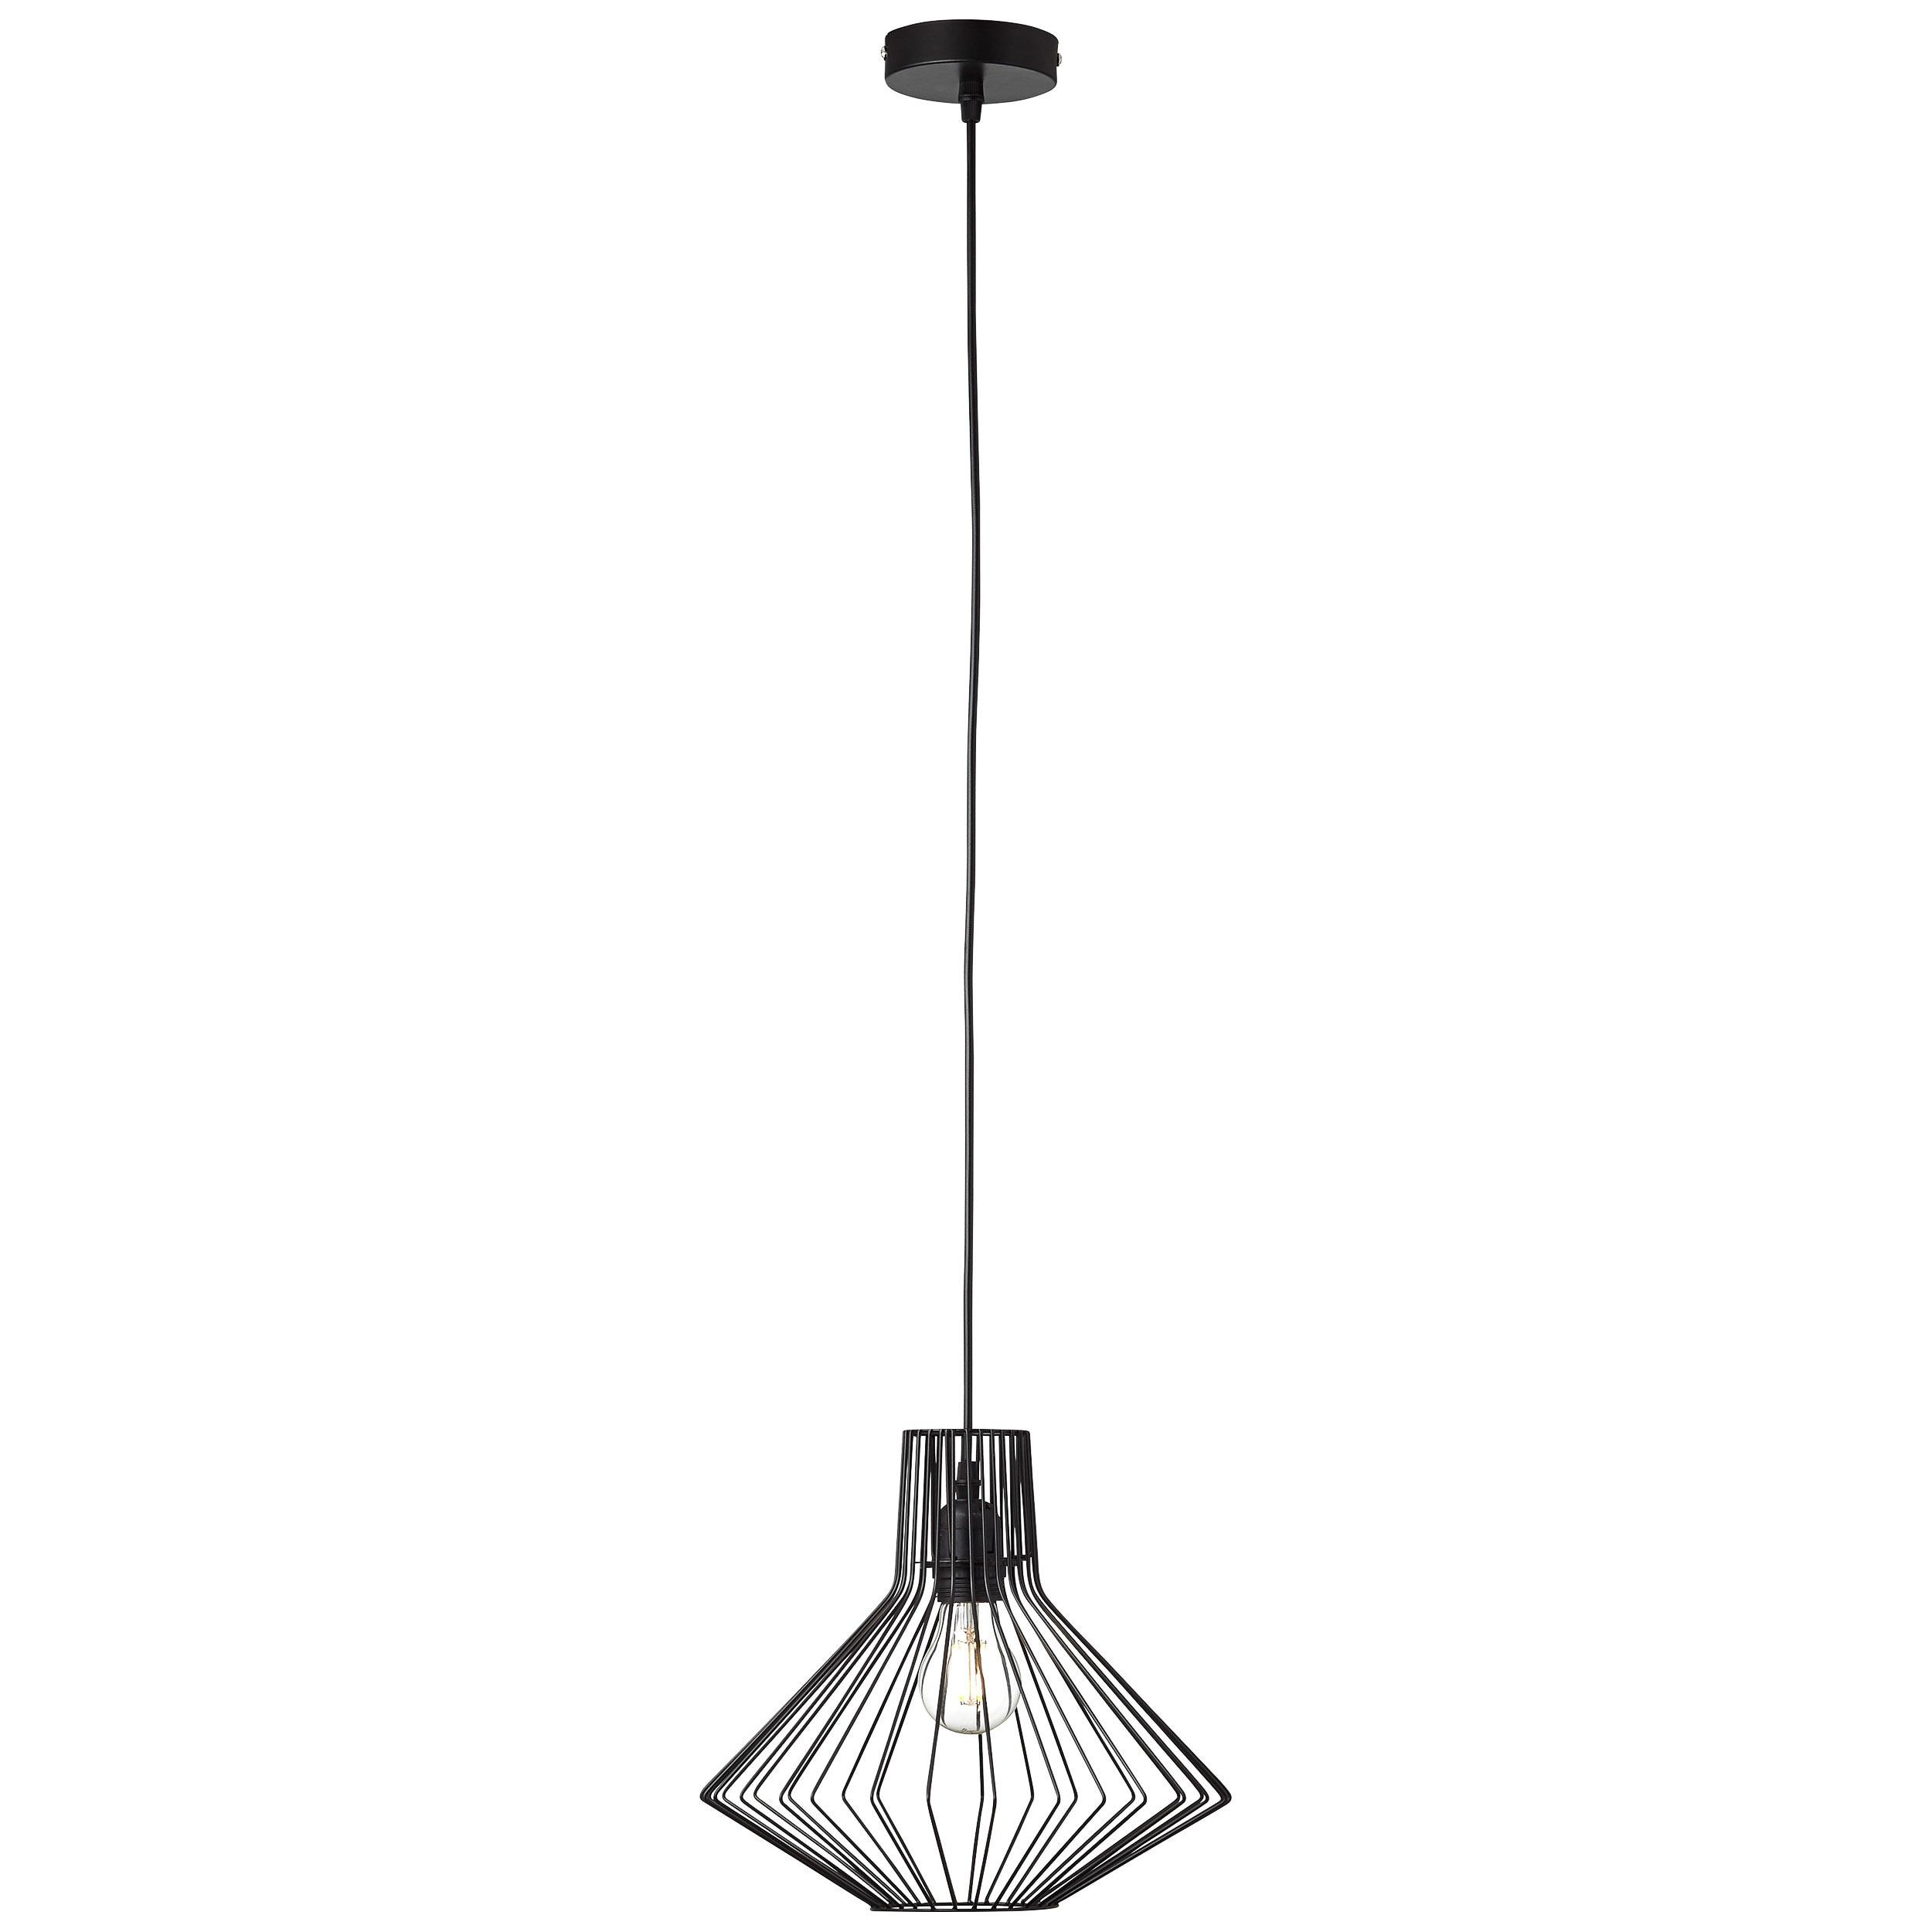 Brilliant Leuchten Dalma Pendelleuchte 30cm schwarz matt